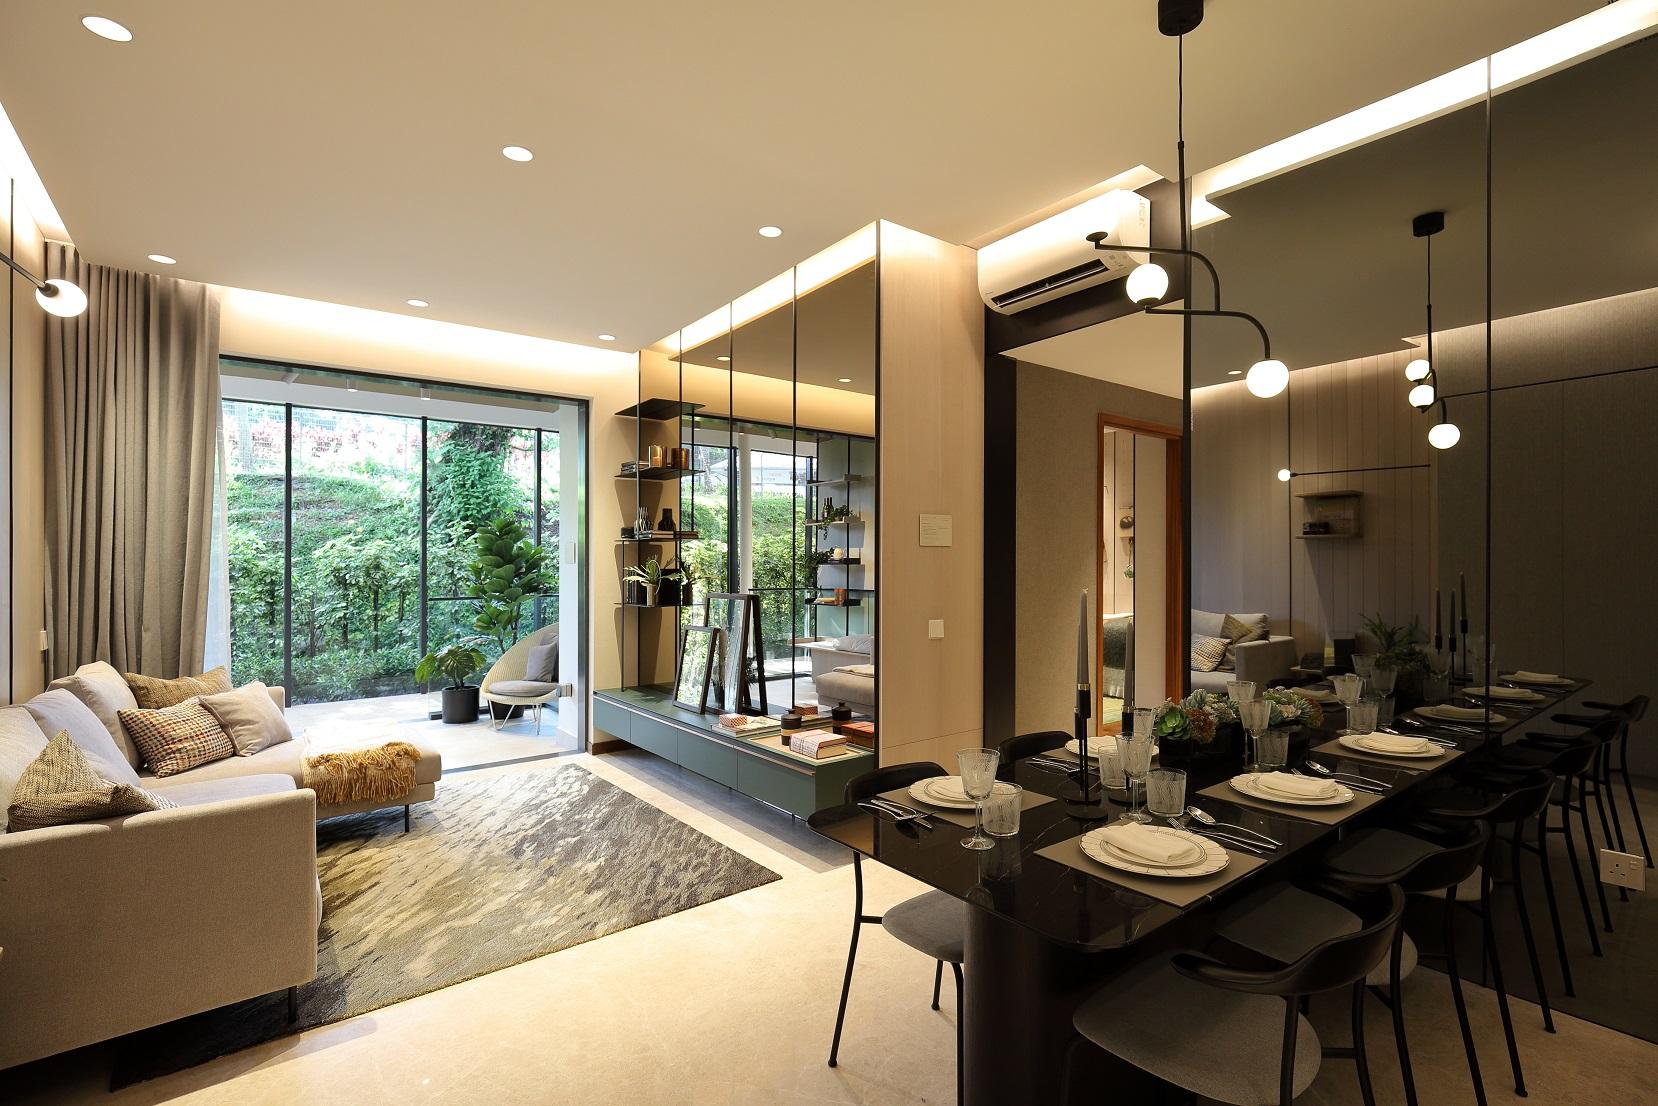 FOURTH AVENUE RESIDENCES - Three-bedroom suite - EDGEPROP SINGAPORE